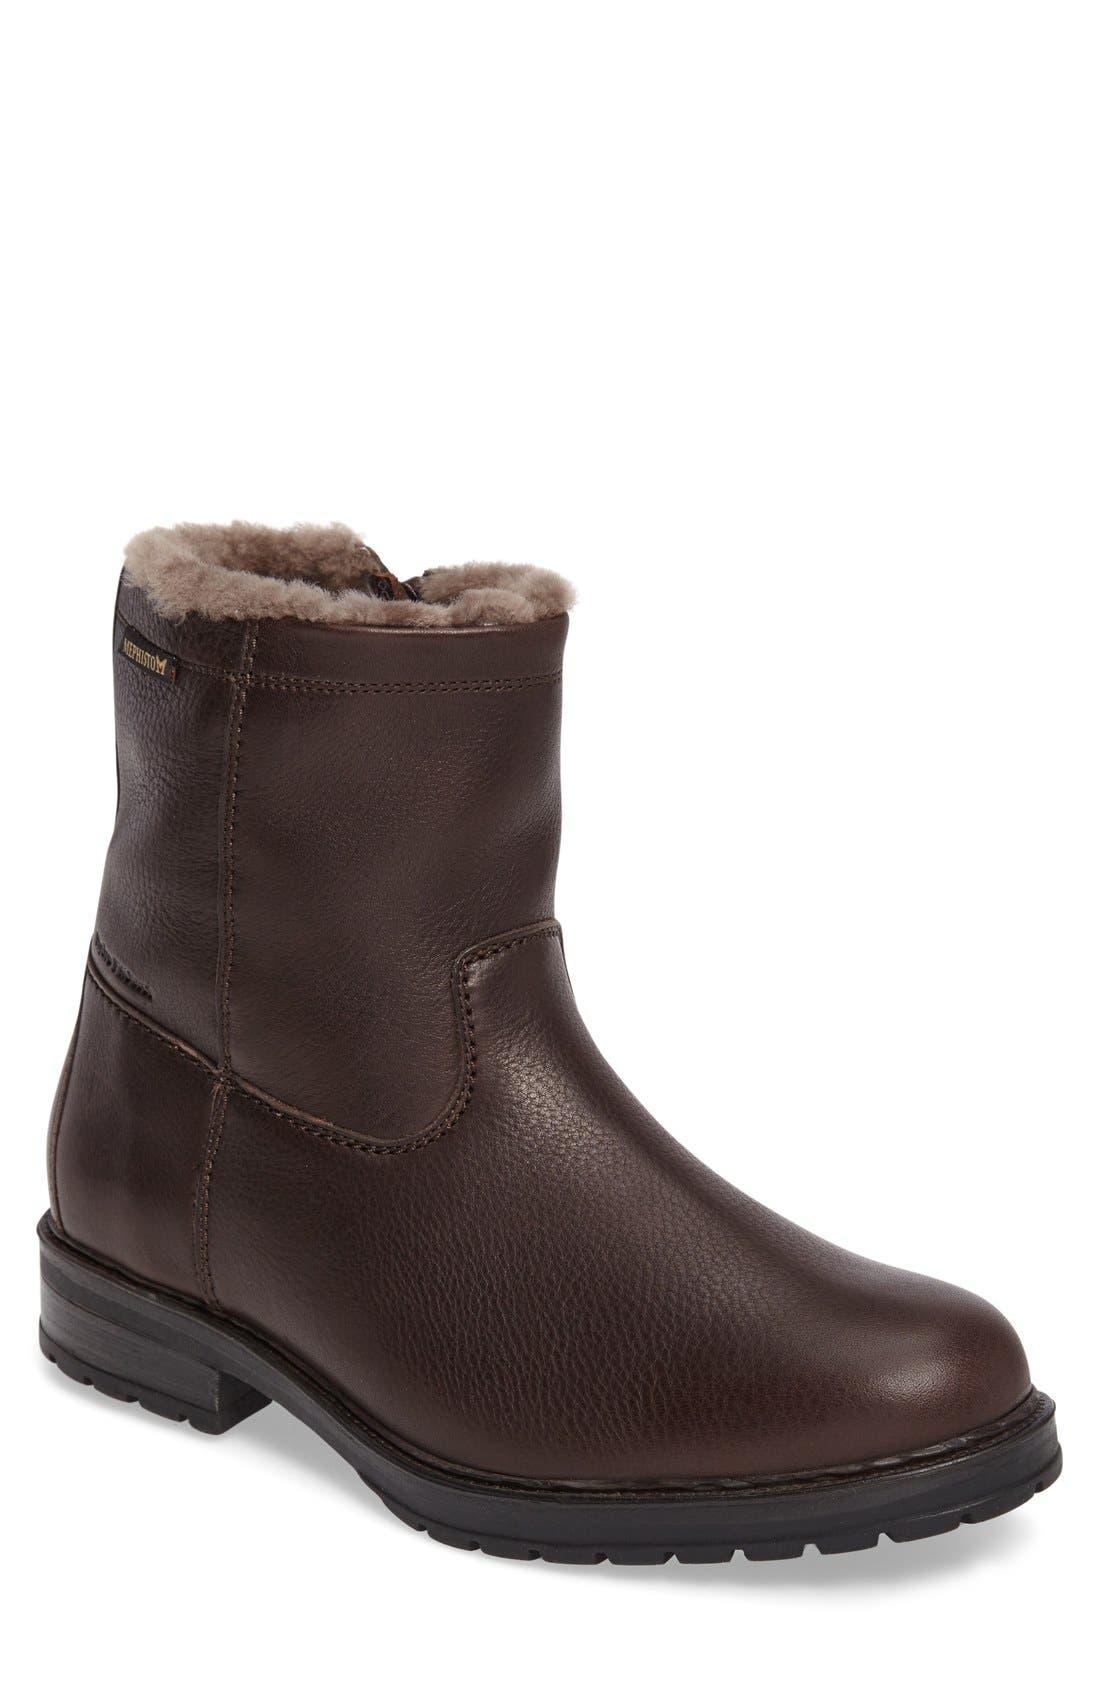 Leonardo Genuine Shearling Lined Boot, Main, color, DARK BROWN MONTANA